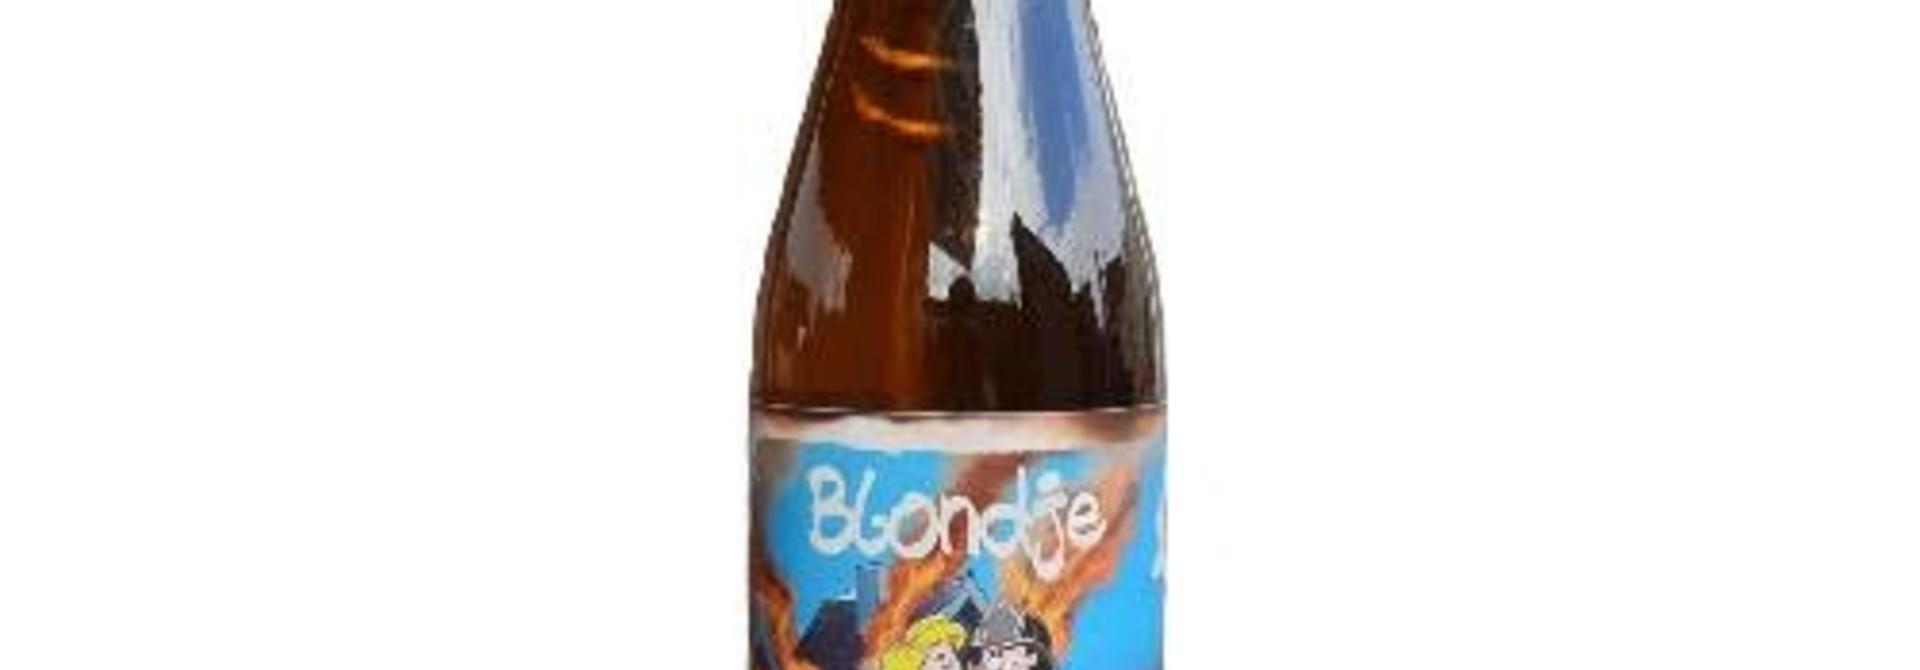 BLUSWATER - BLONDJE 33CL